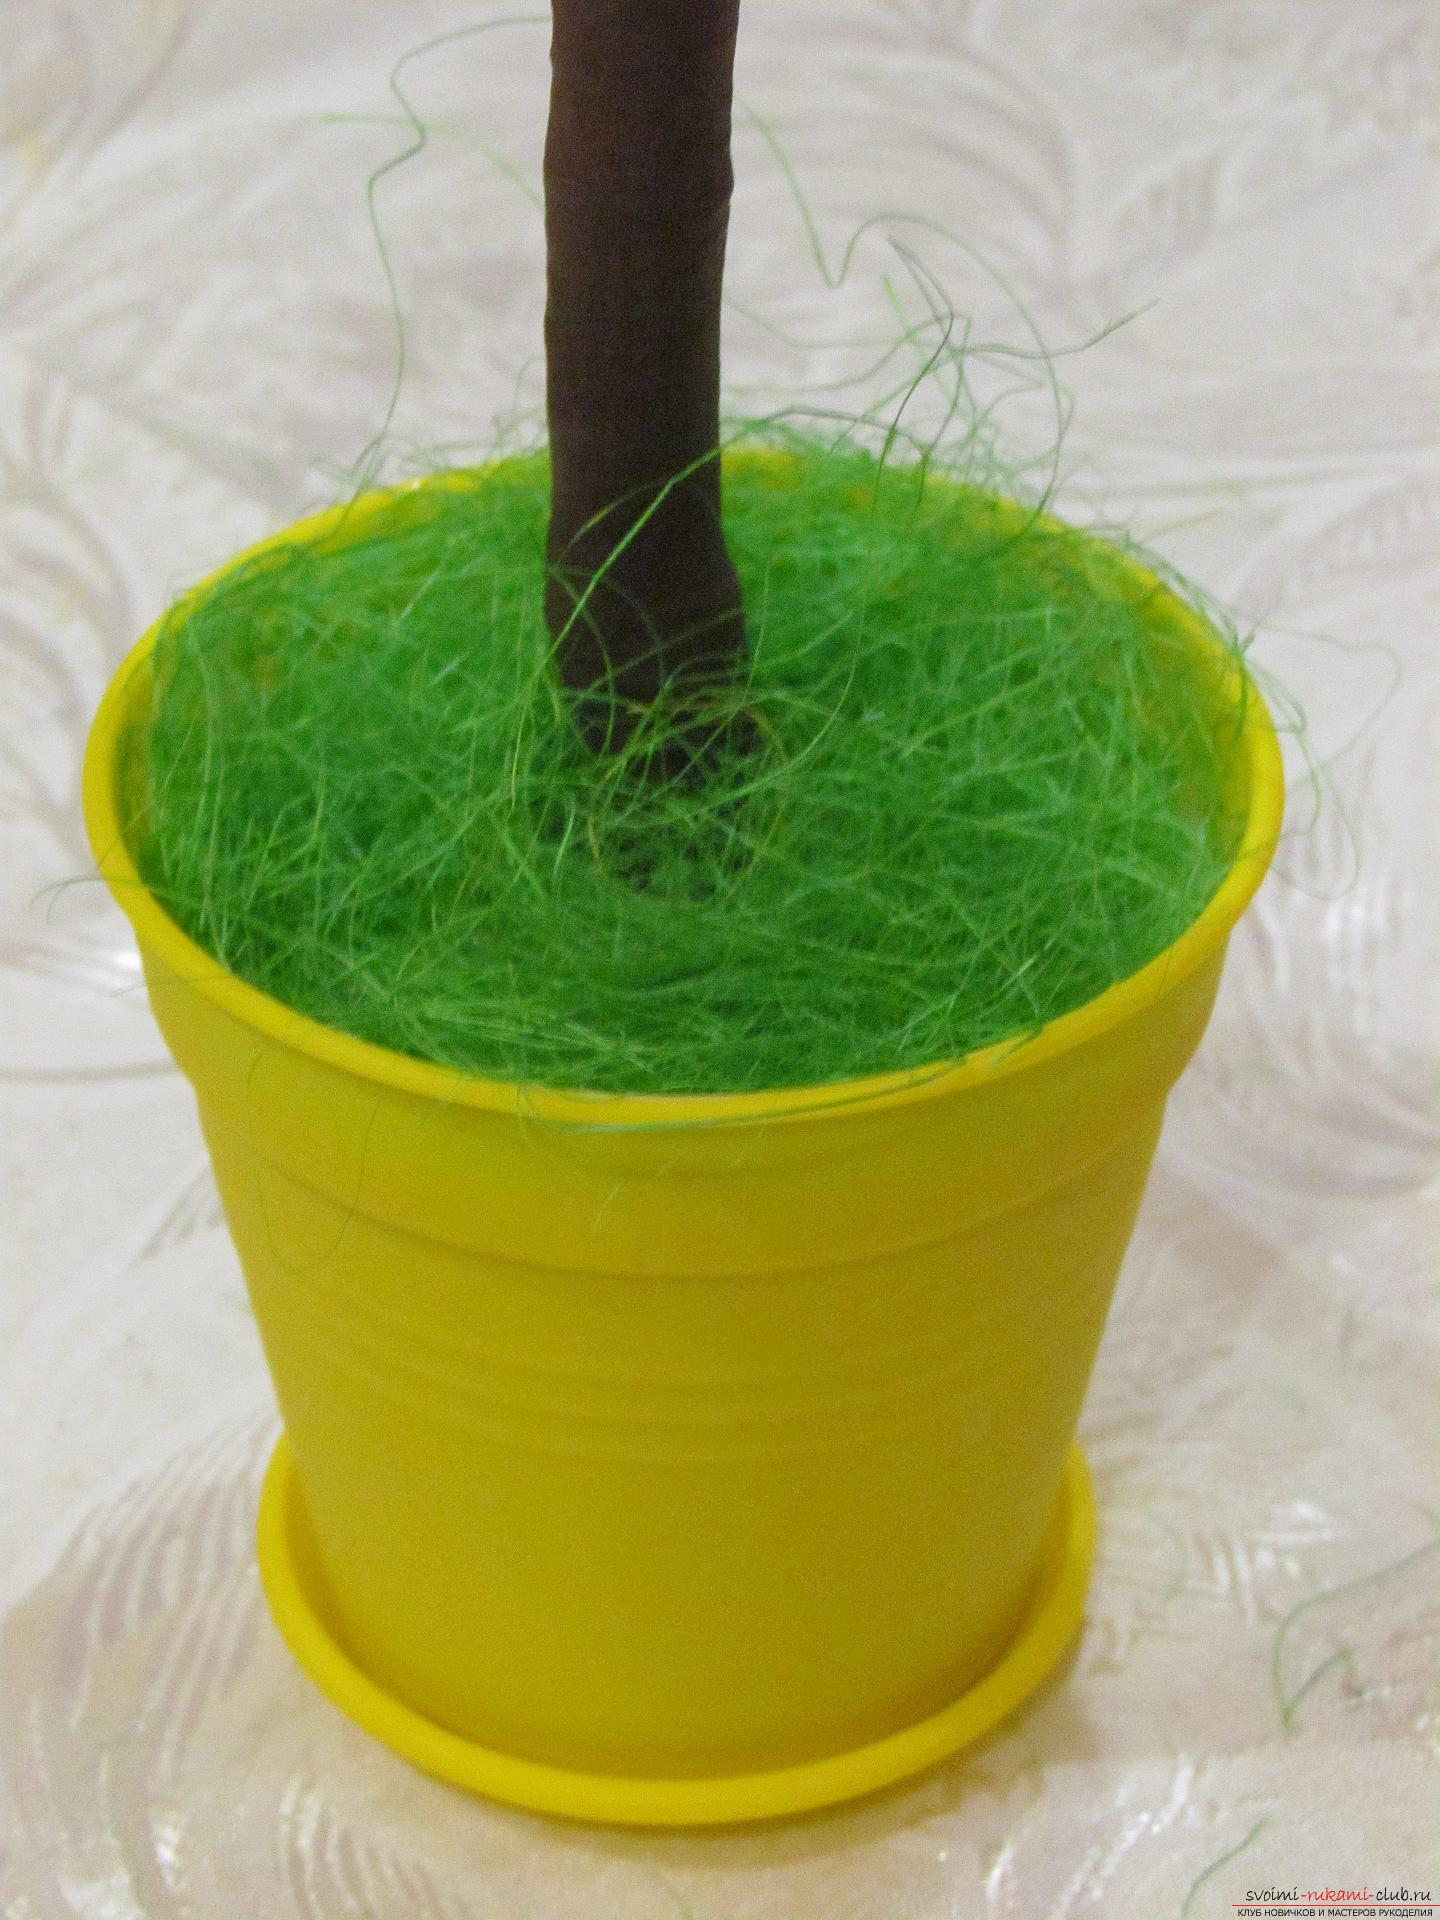 Трава для поделки своими руками фото